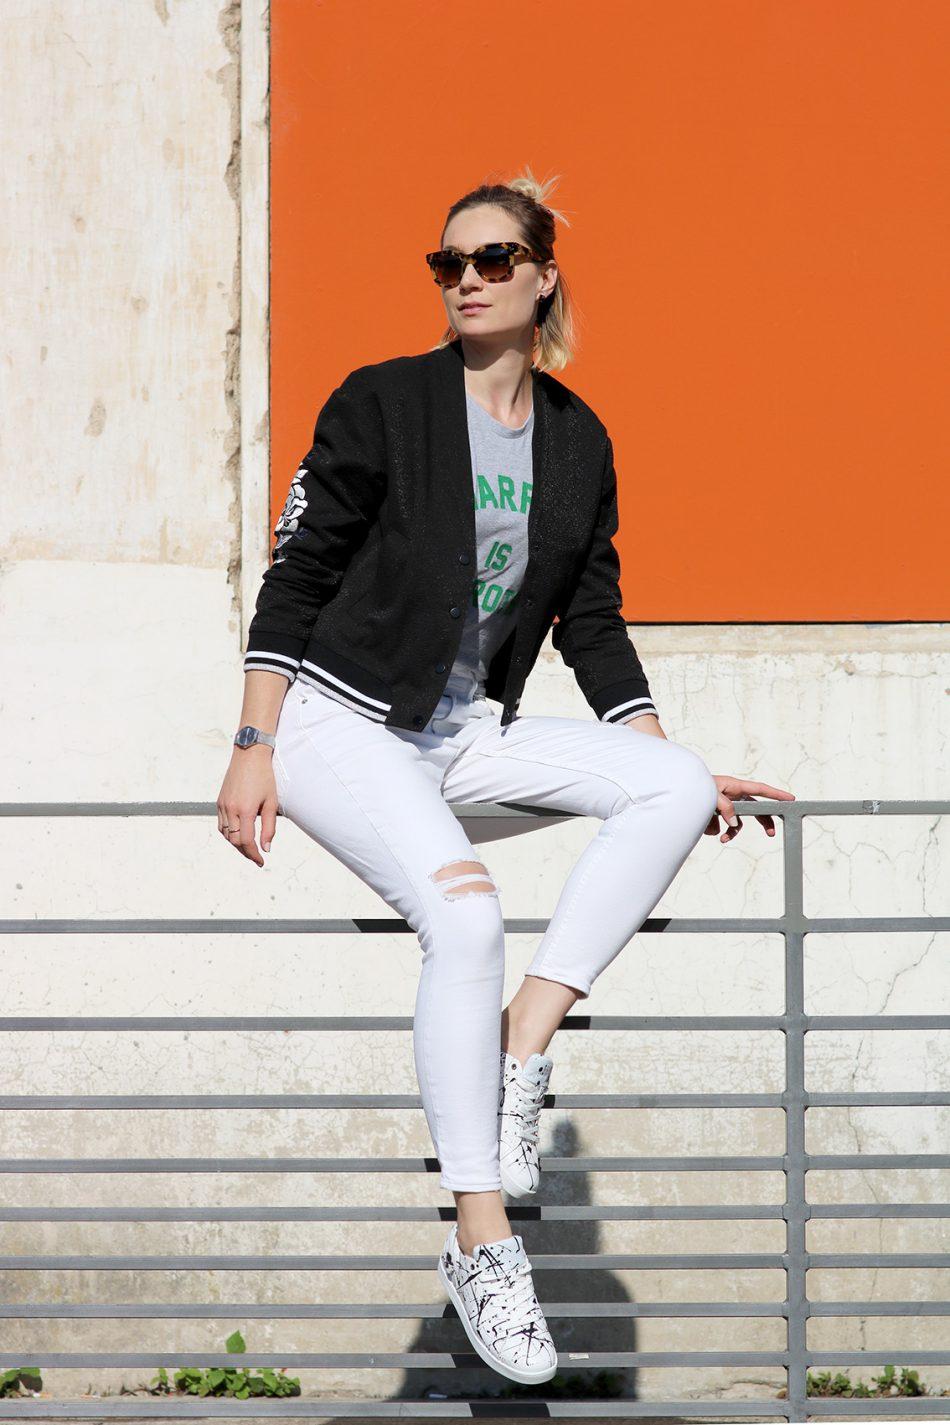 blogueuse-mode-lyonnaise-lyon-artlex